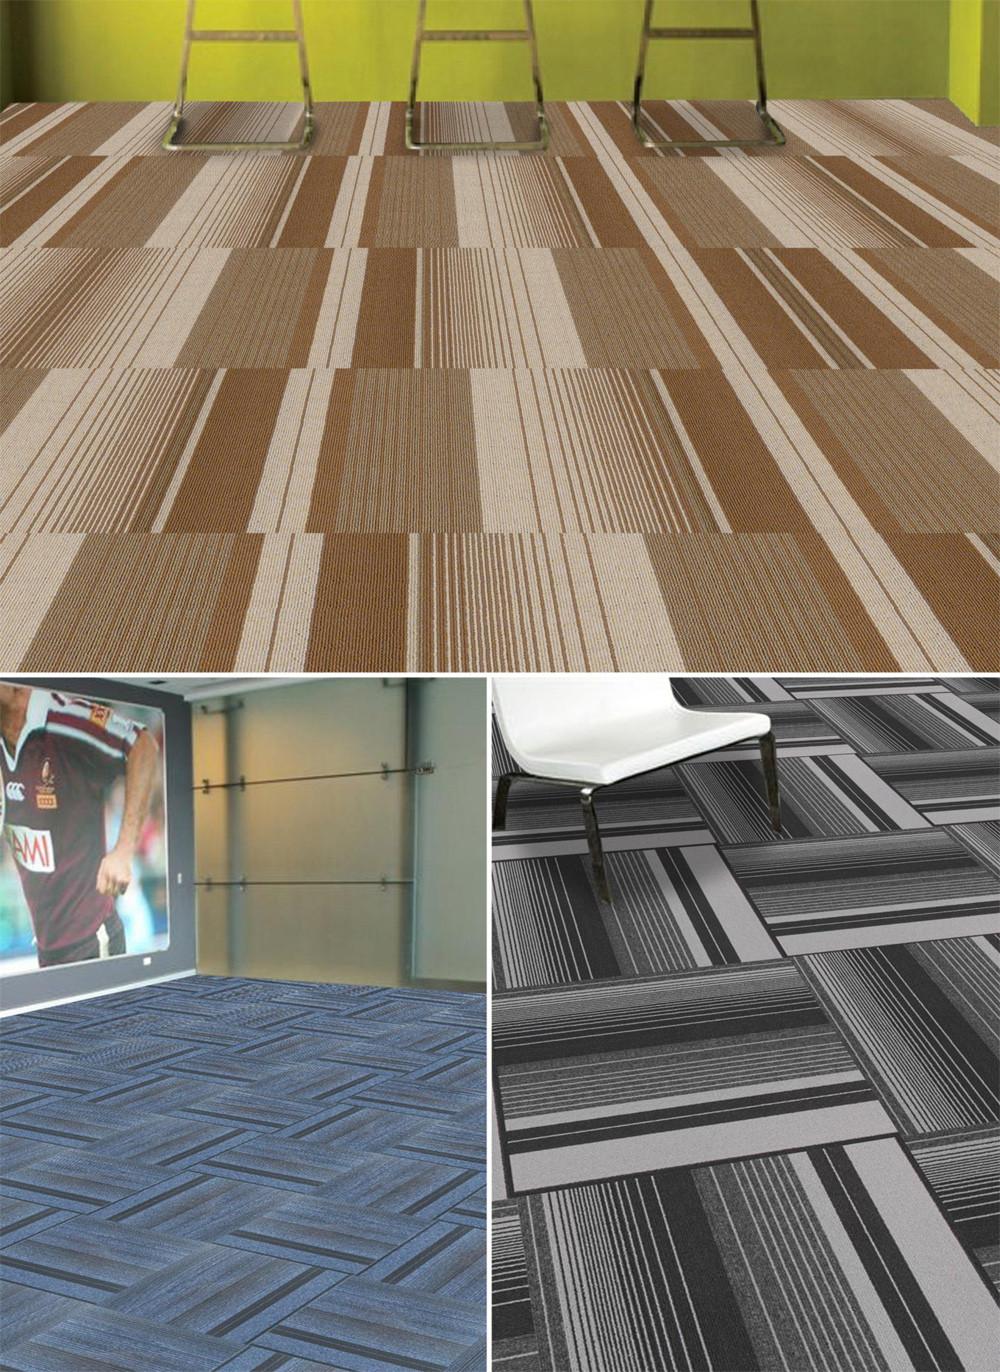 Stripe Commercial Pvc Backing Carpet Squares Buy Carpet